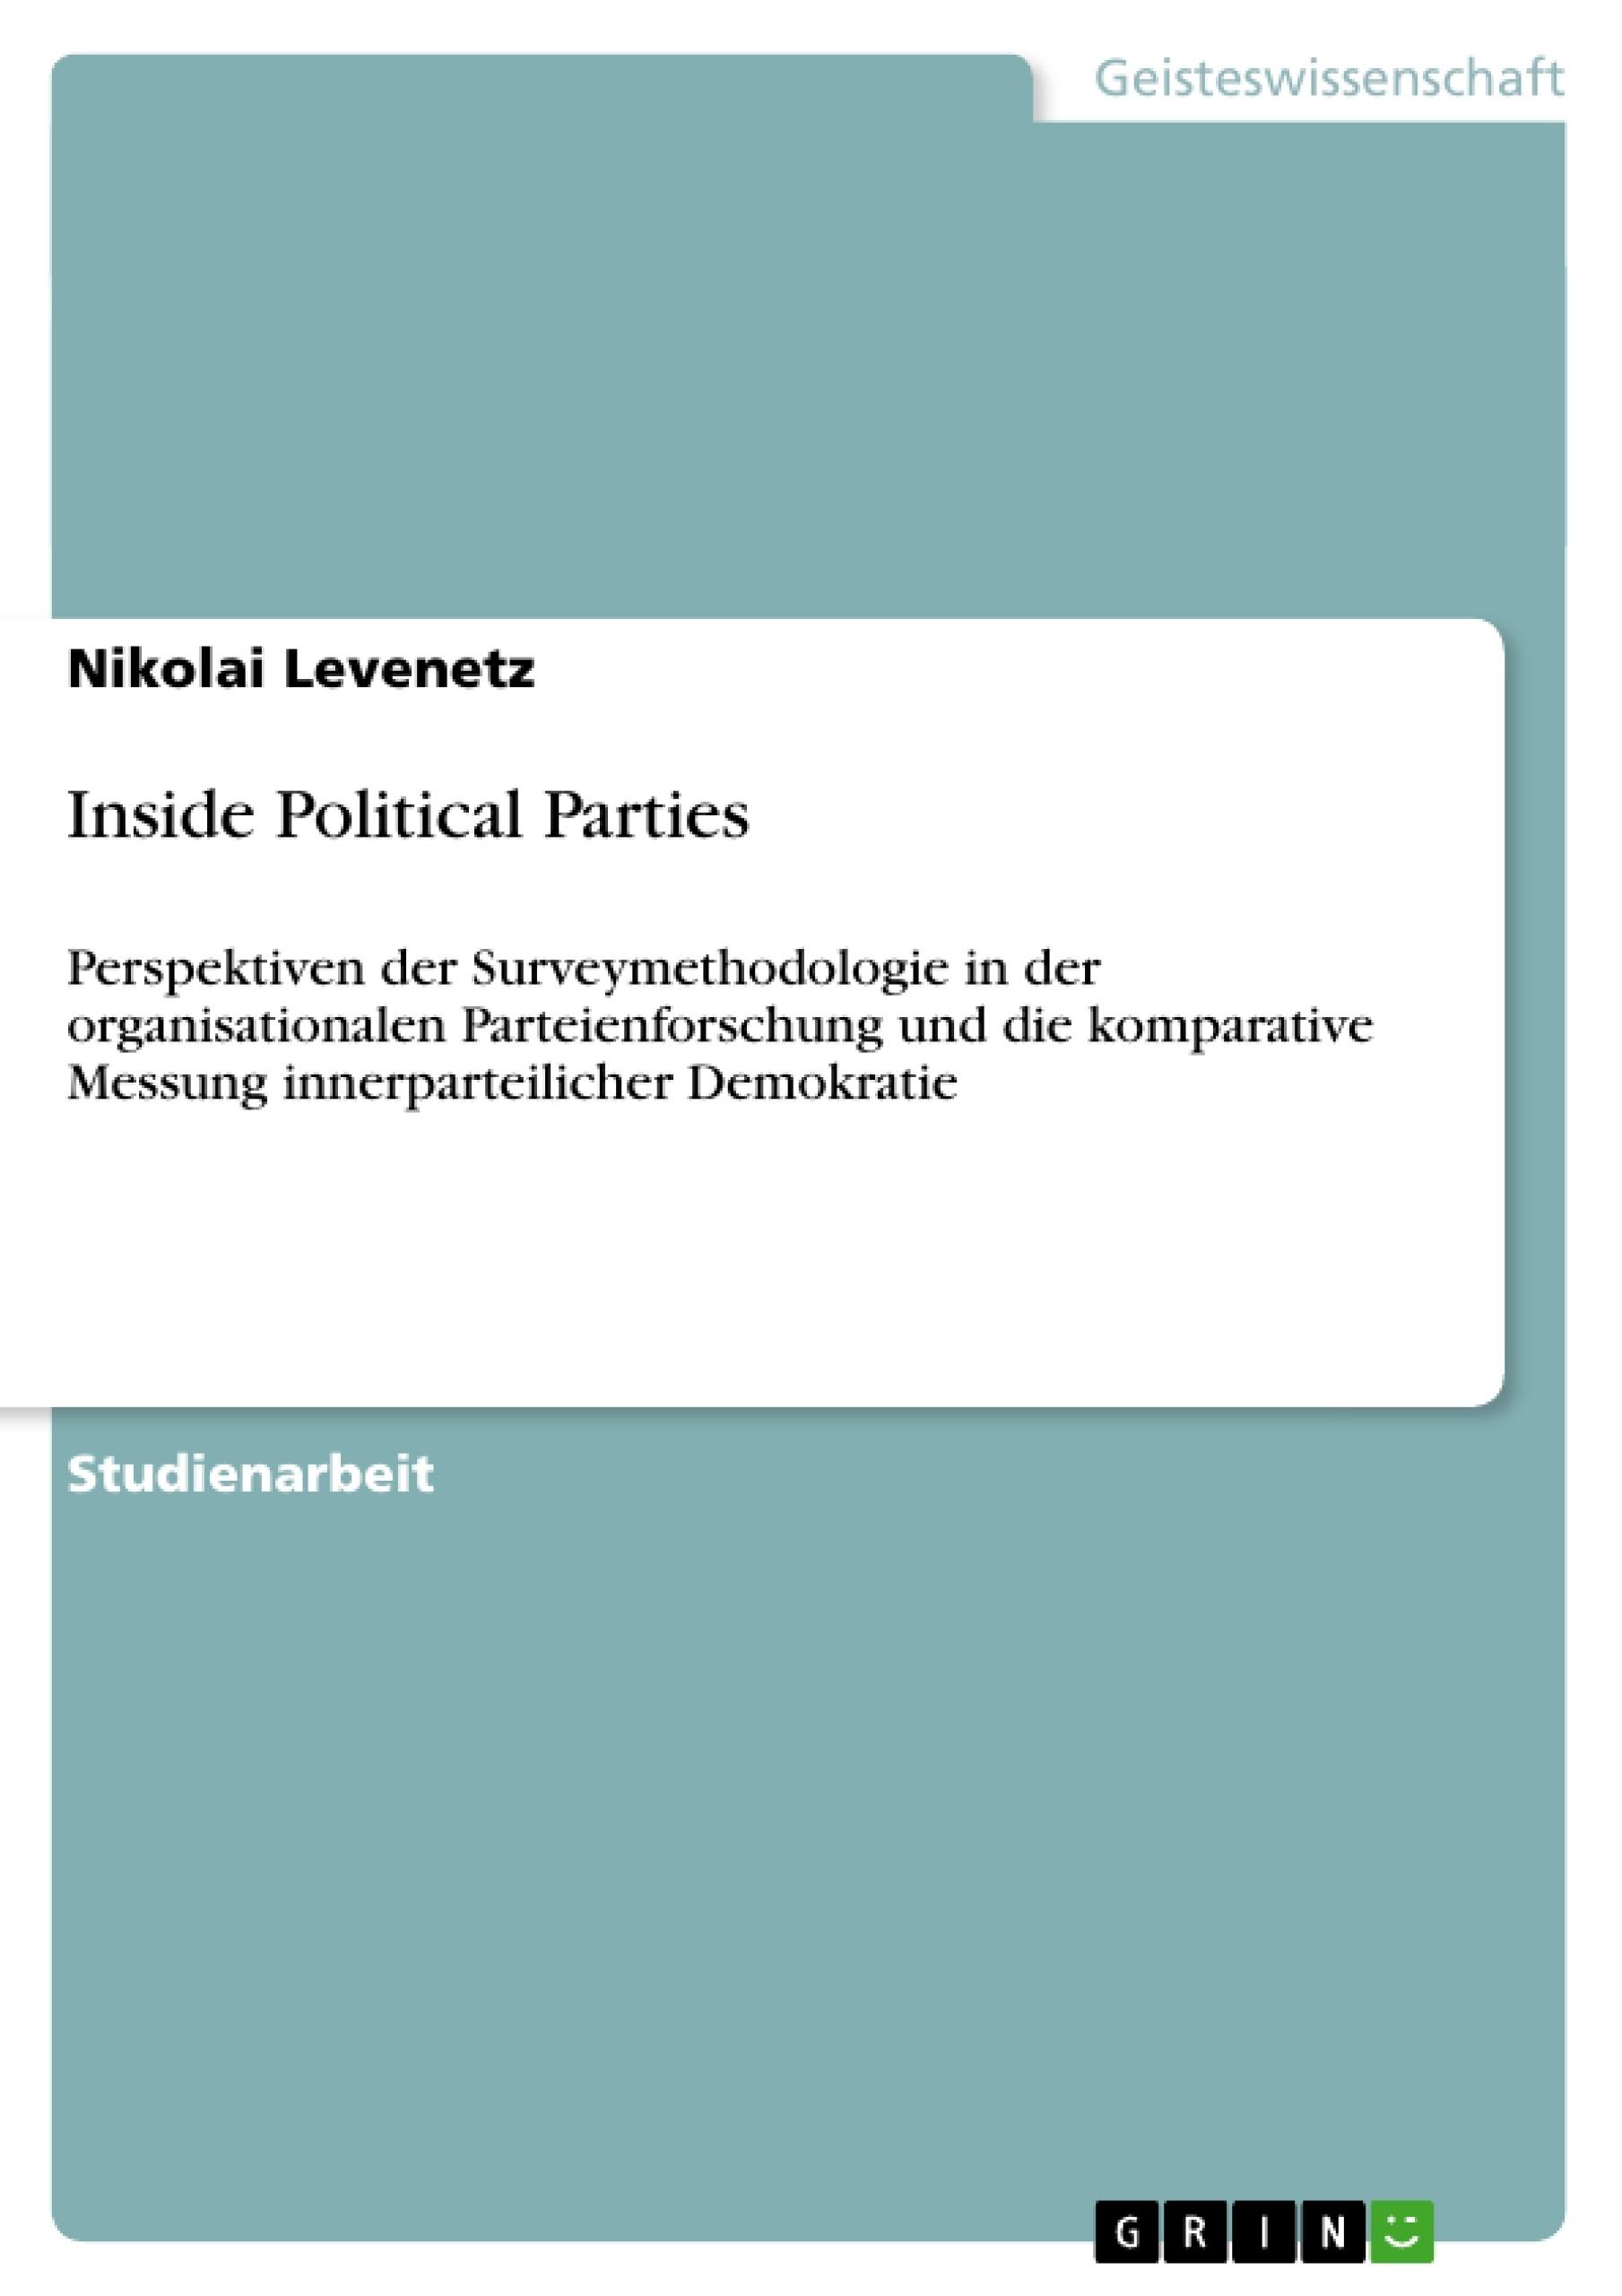 Titel: Inside Political Parties